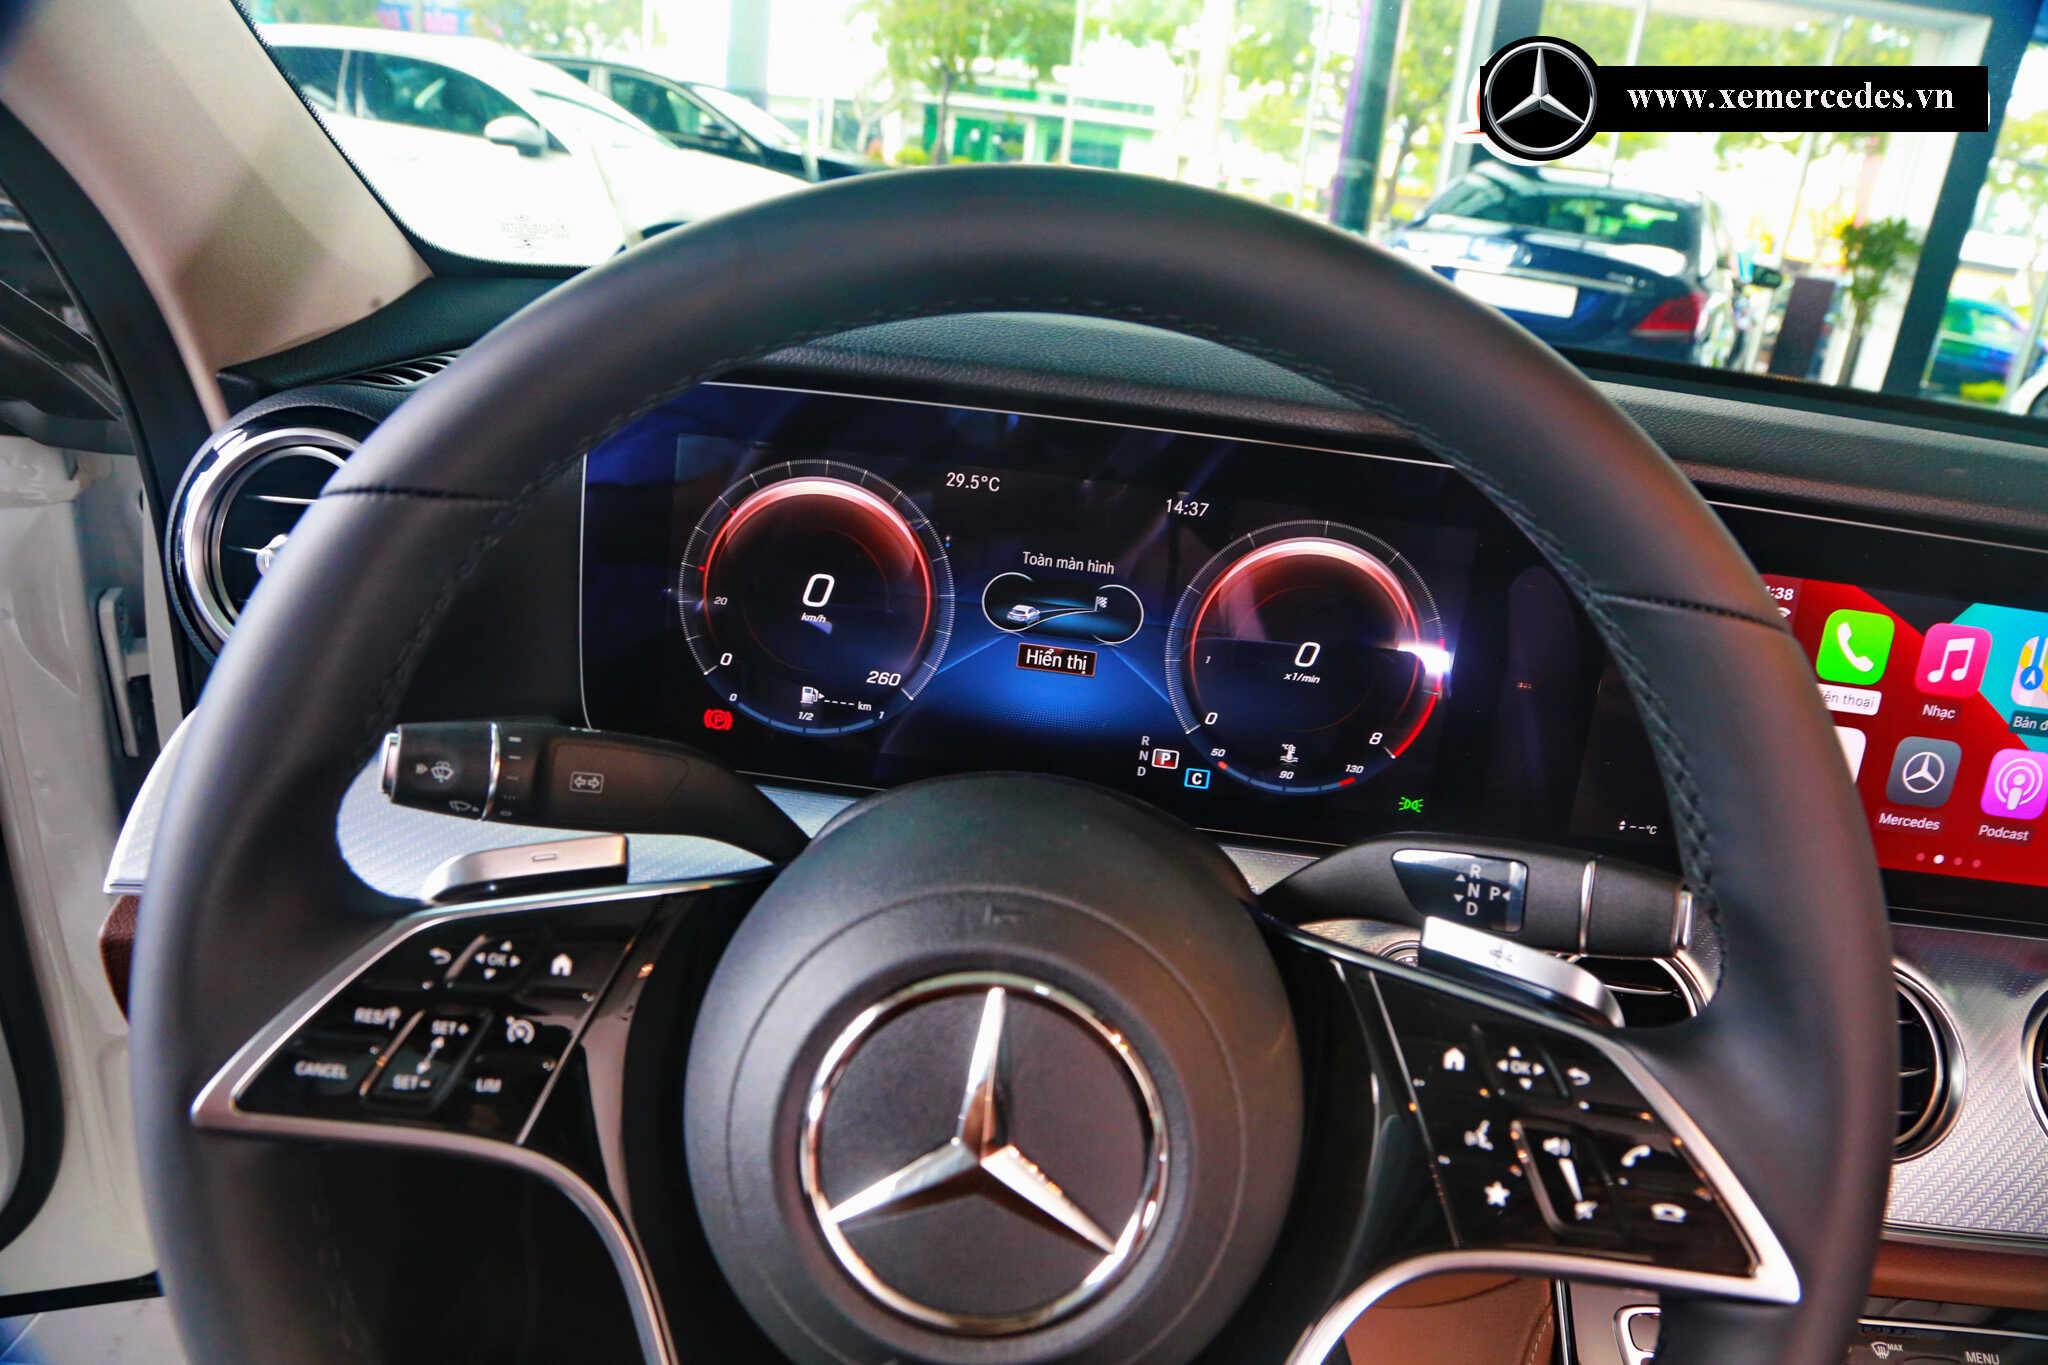 Giá lăn bánh Mercedes E180